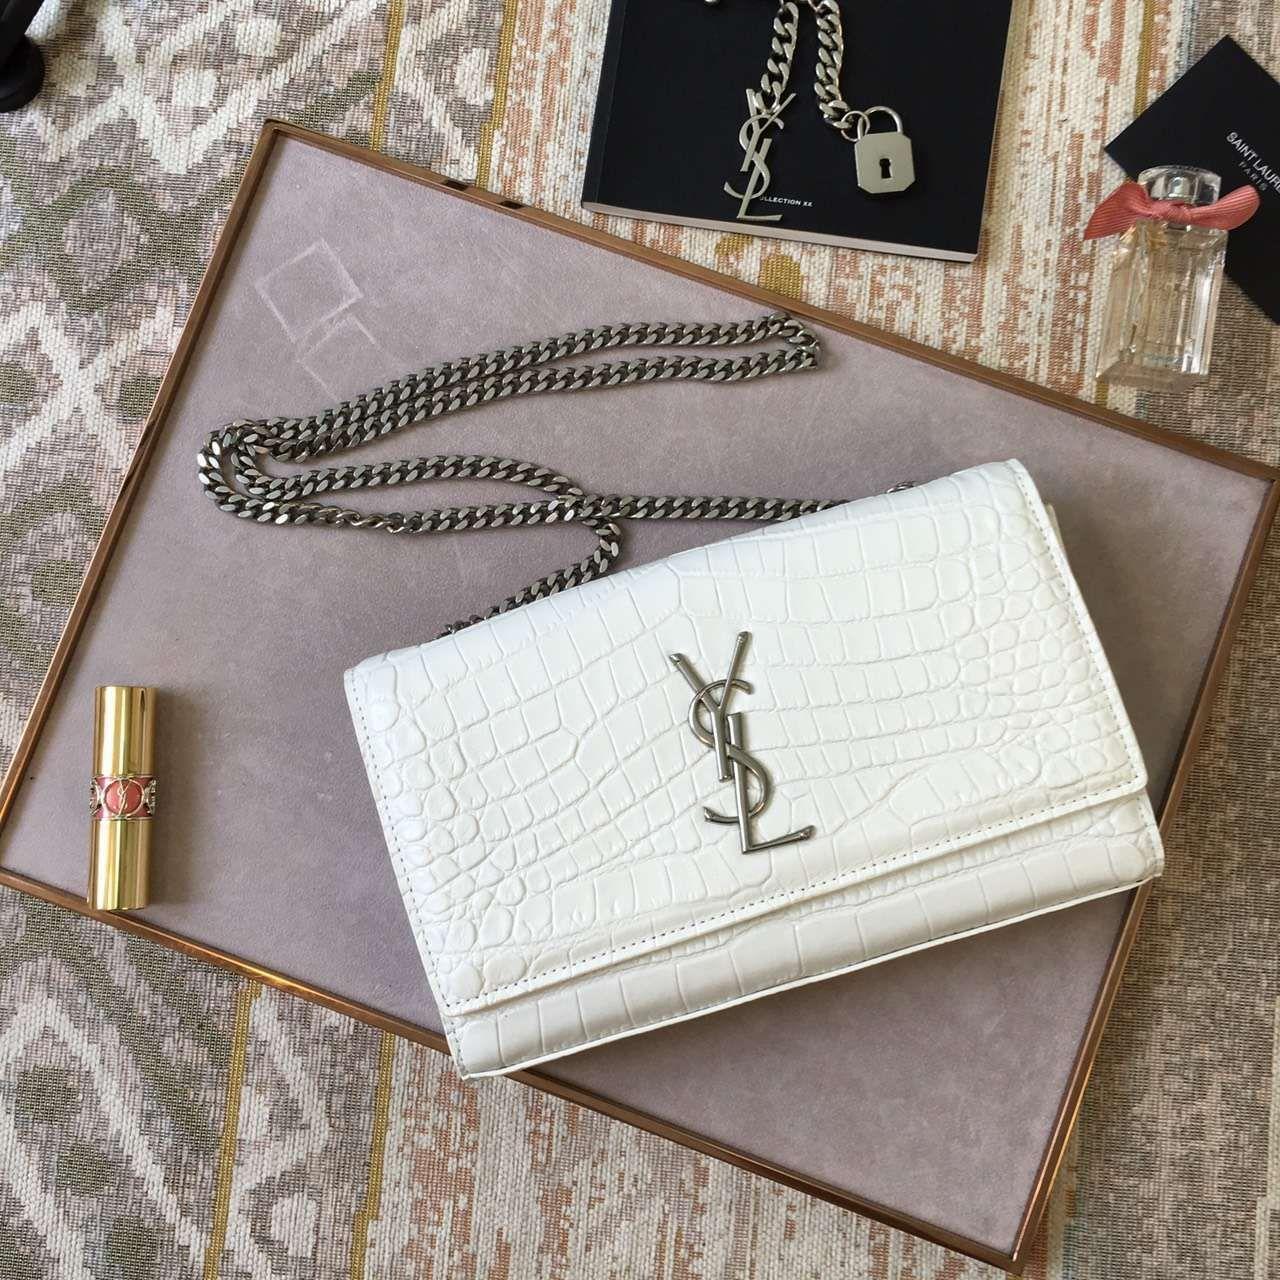 35951b7f332 S/S 2016 New Saint Laurent Bag Cheap Sale-Saint Laurent Medium Monogram  Satchel in Dove White Crocodile Embossed Leather